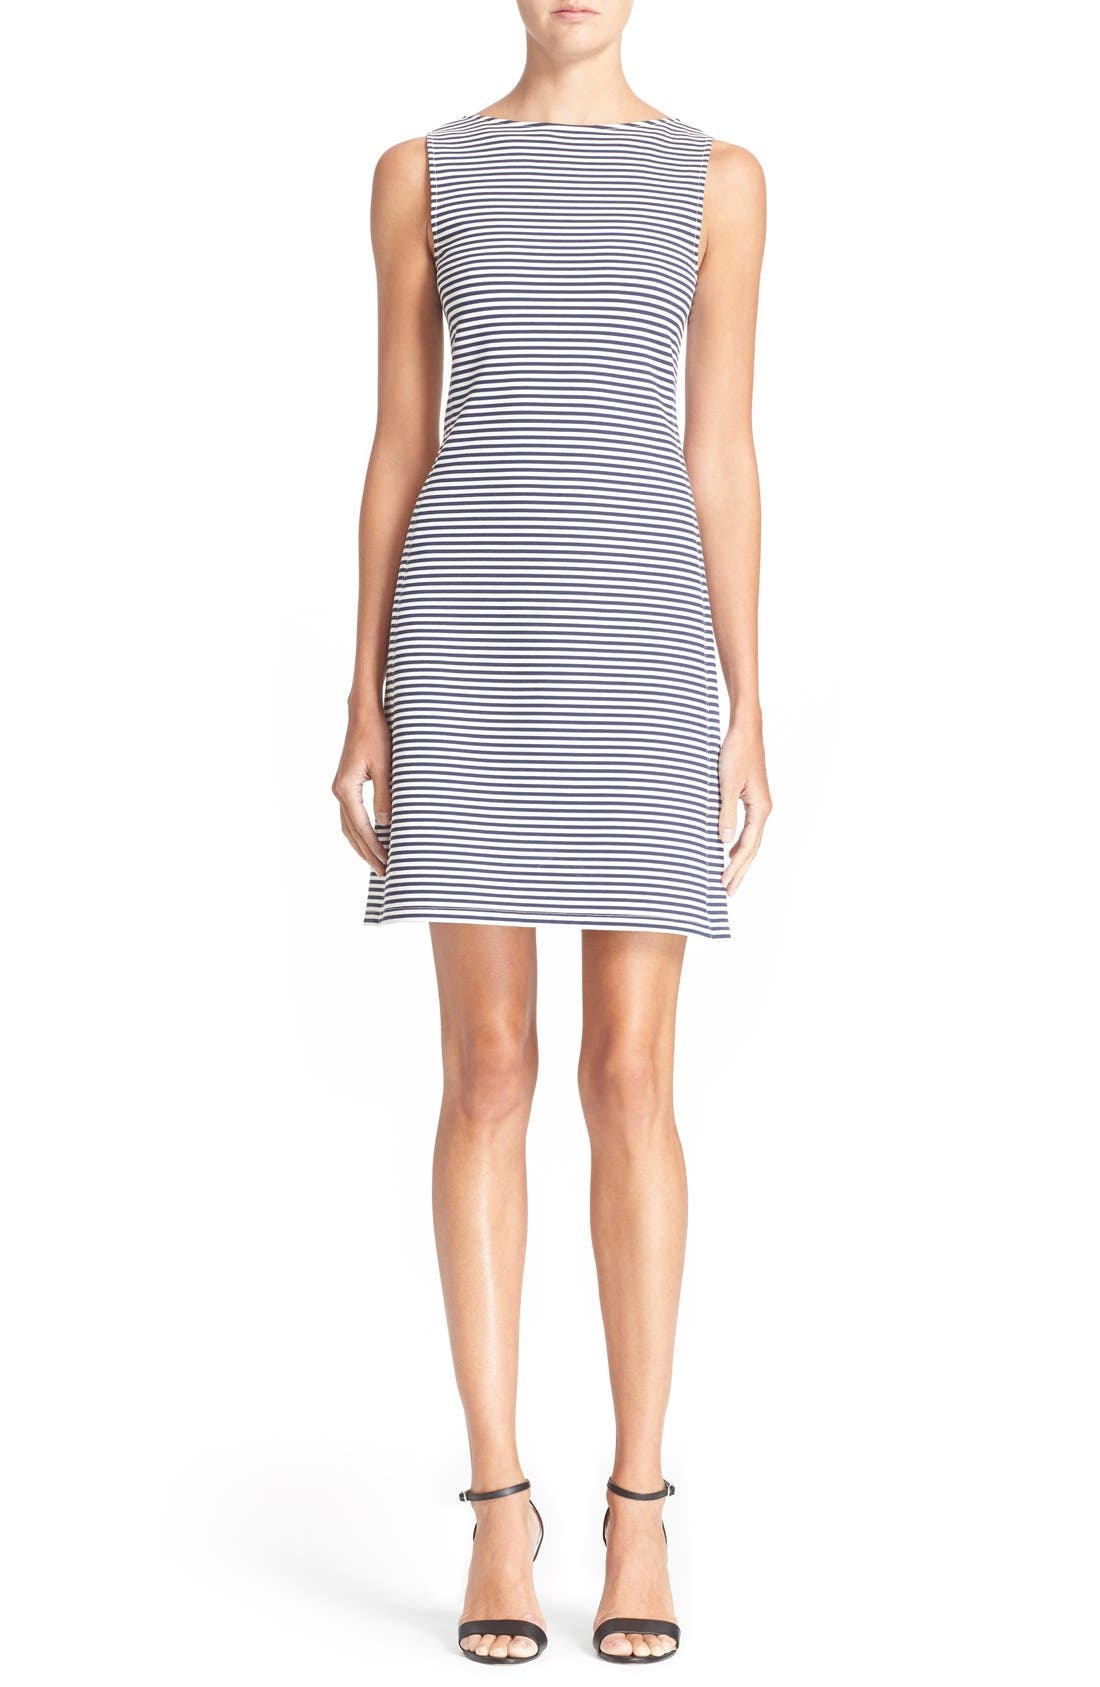 Alternate Image 1 Selected - Theory 'Mivrill' Stripe Sheath Dress